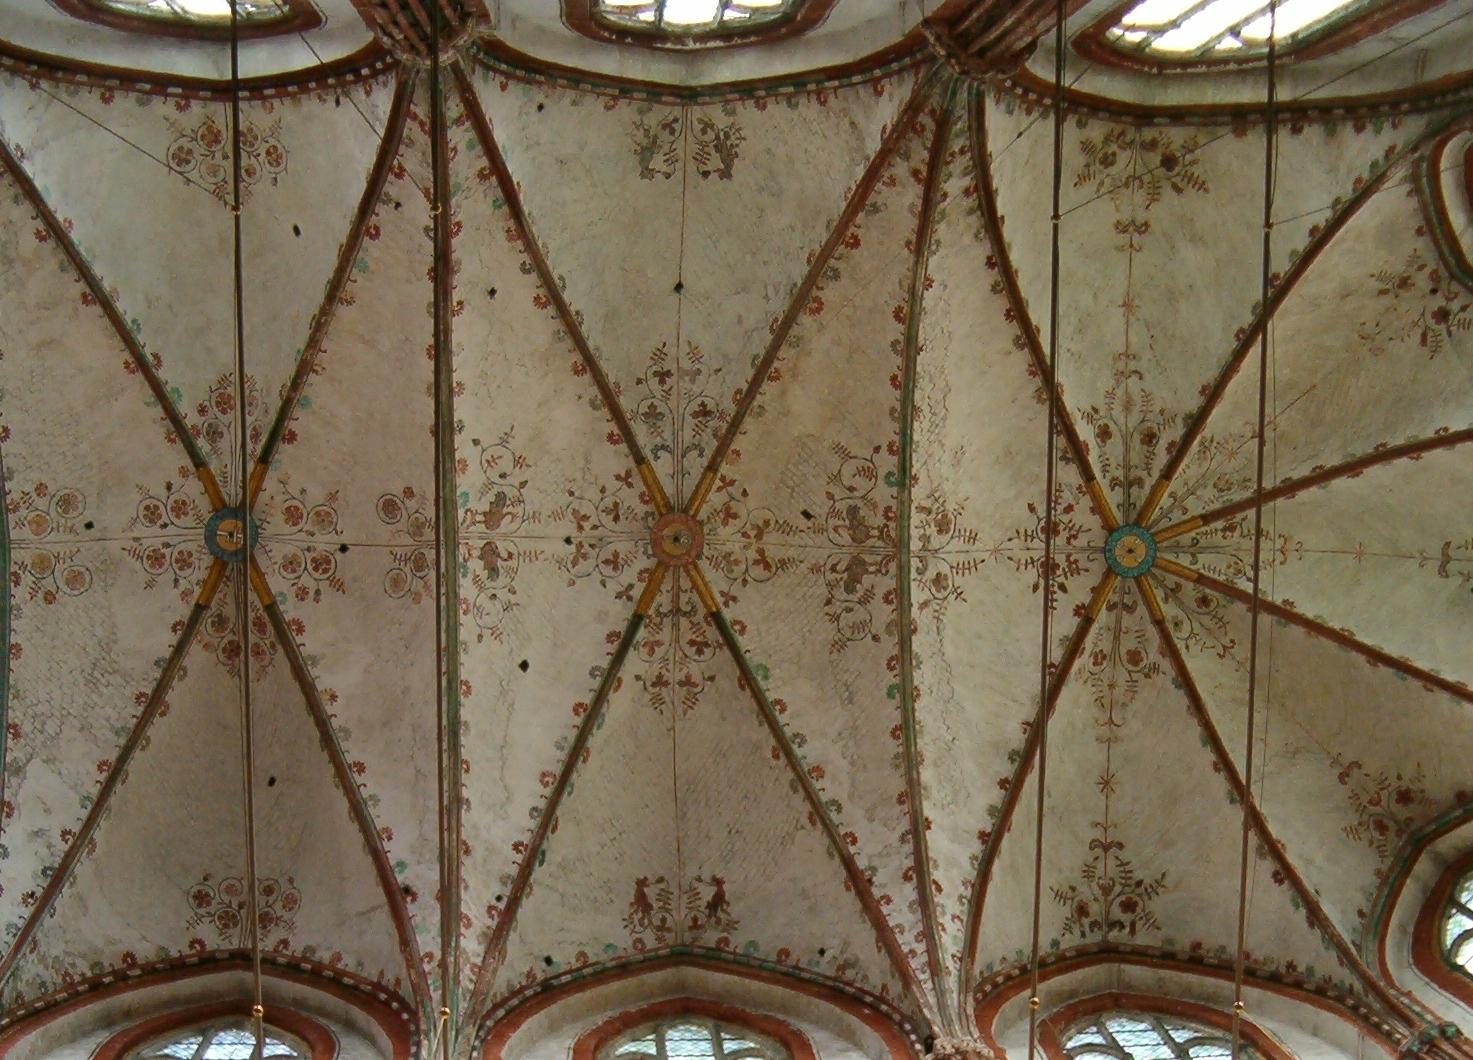 St. Marien, Kirchenschiffdecke